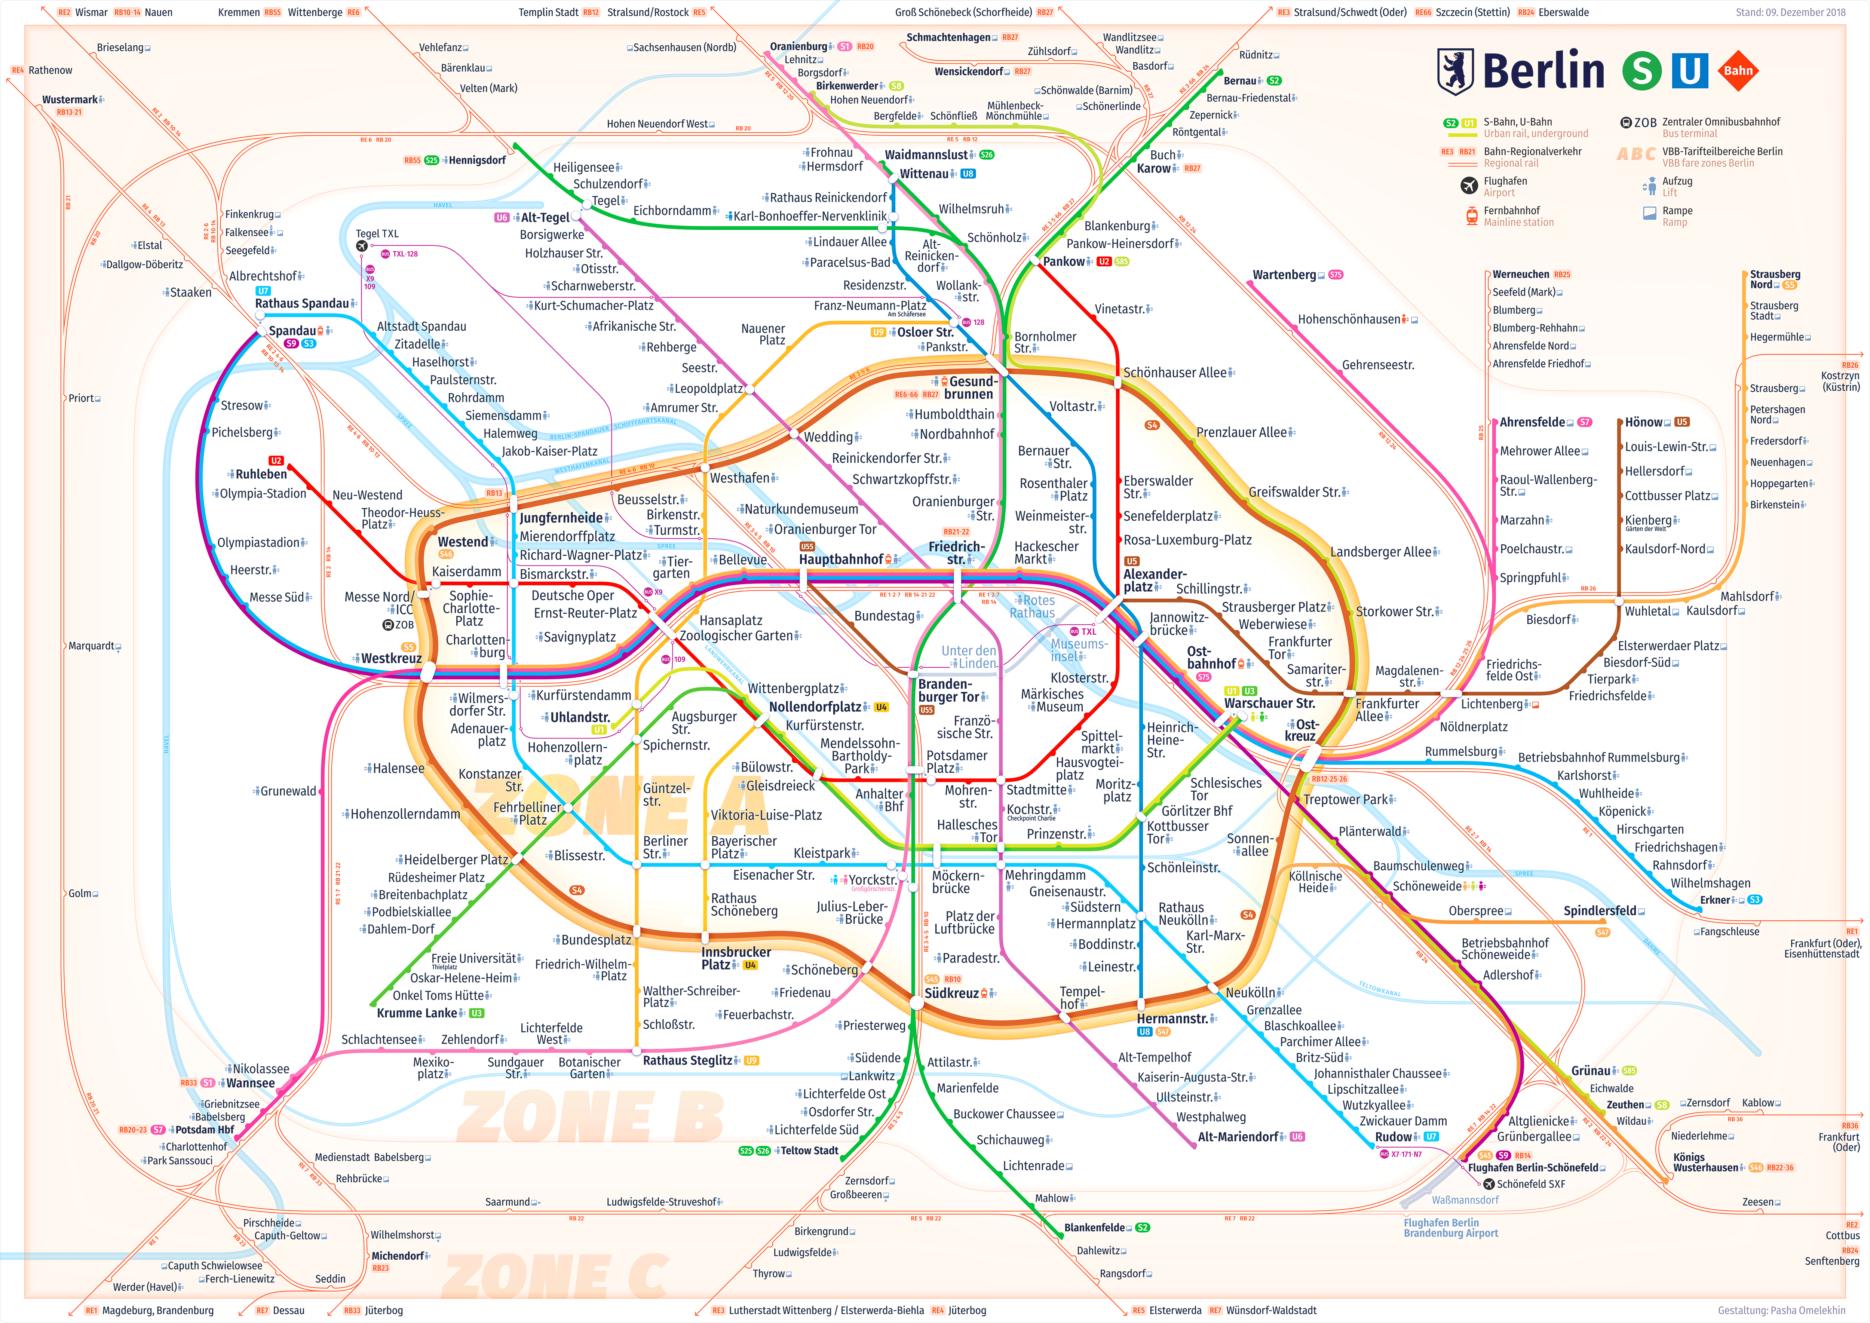 New Berlin Rapid Transit Map, 2018